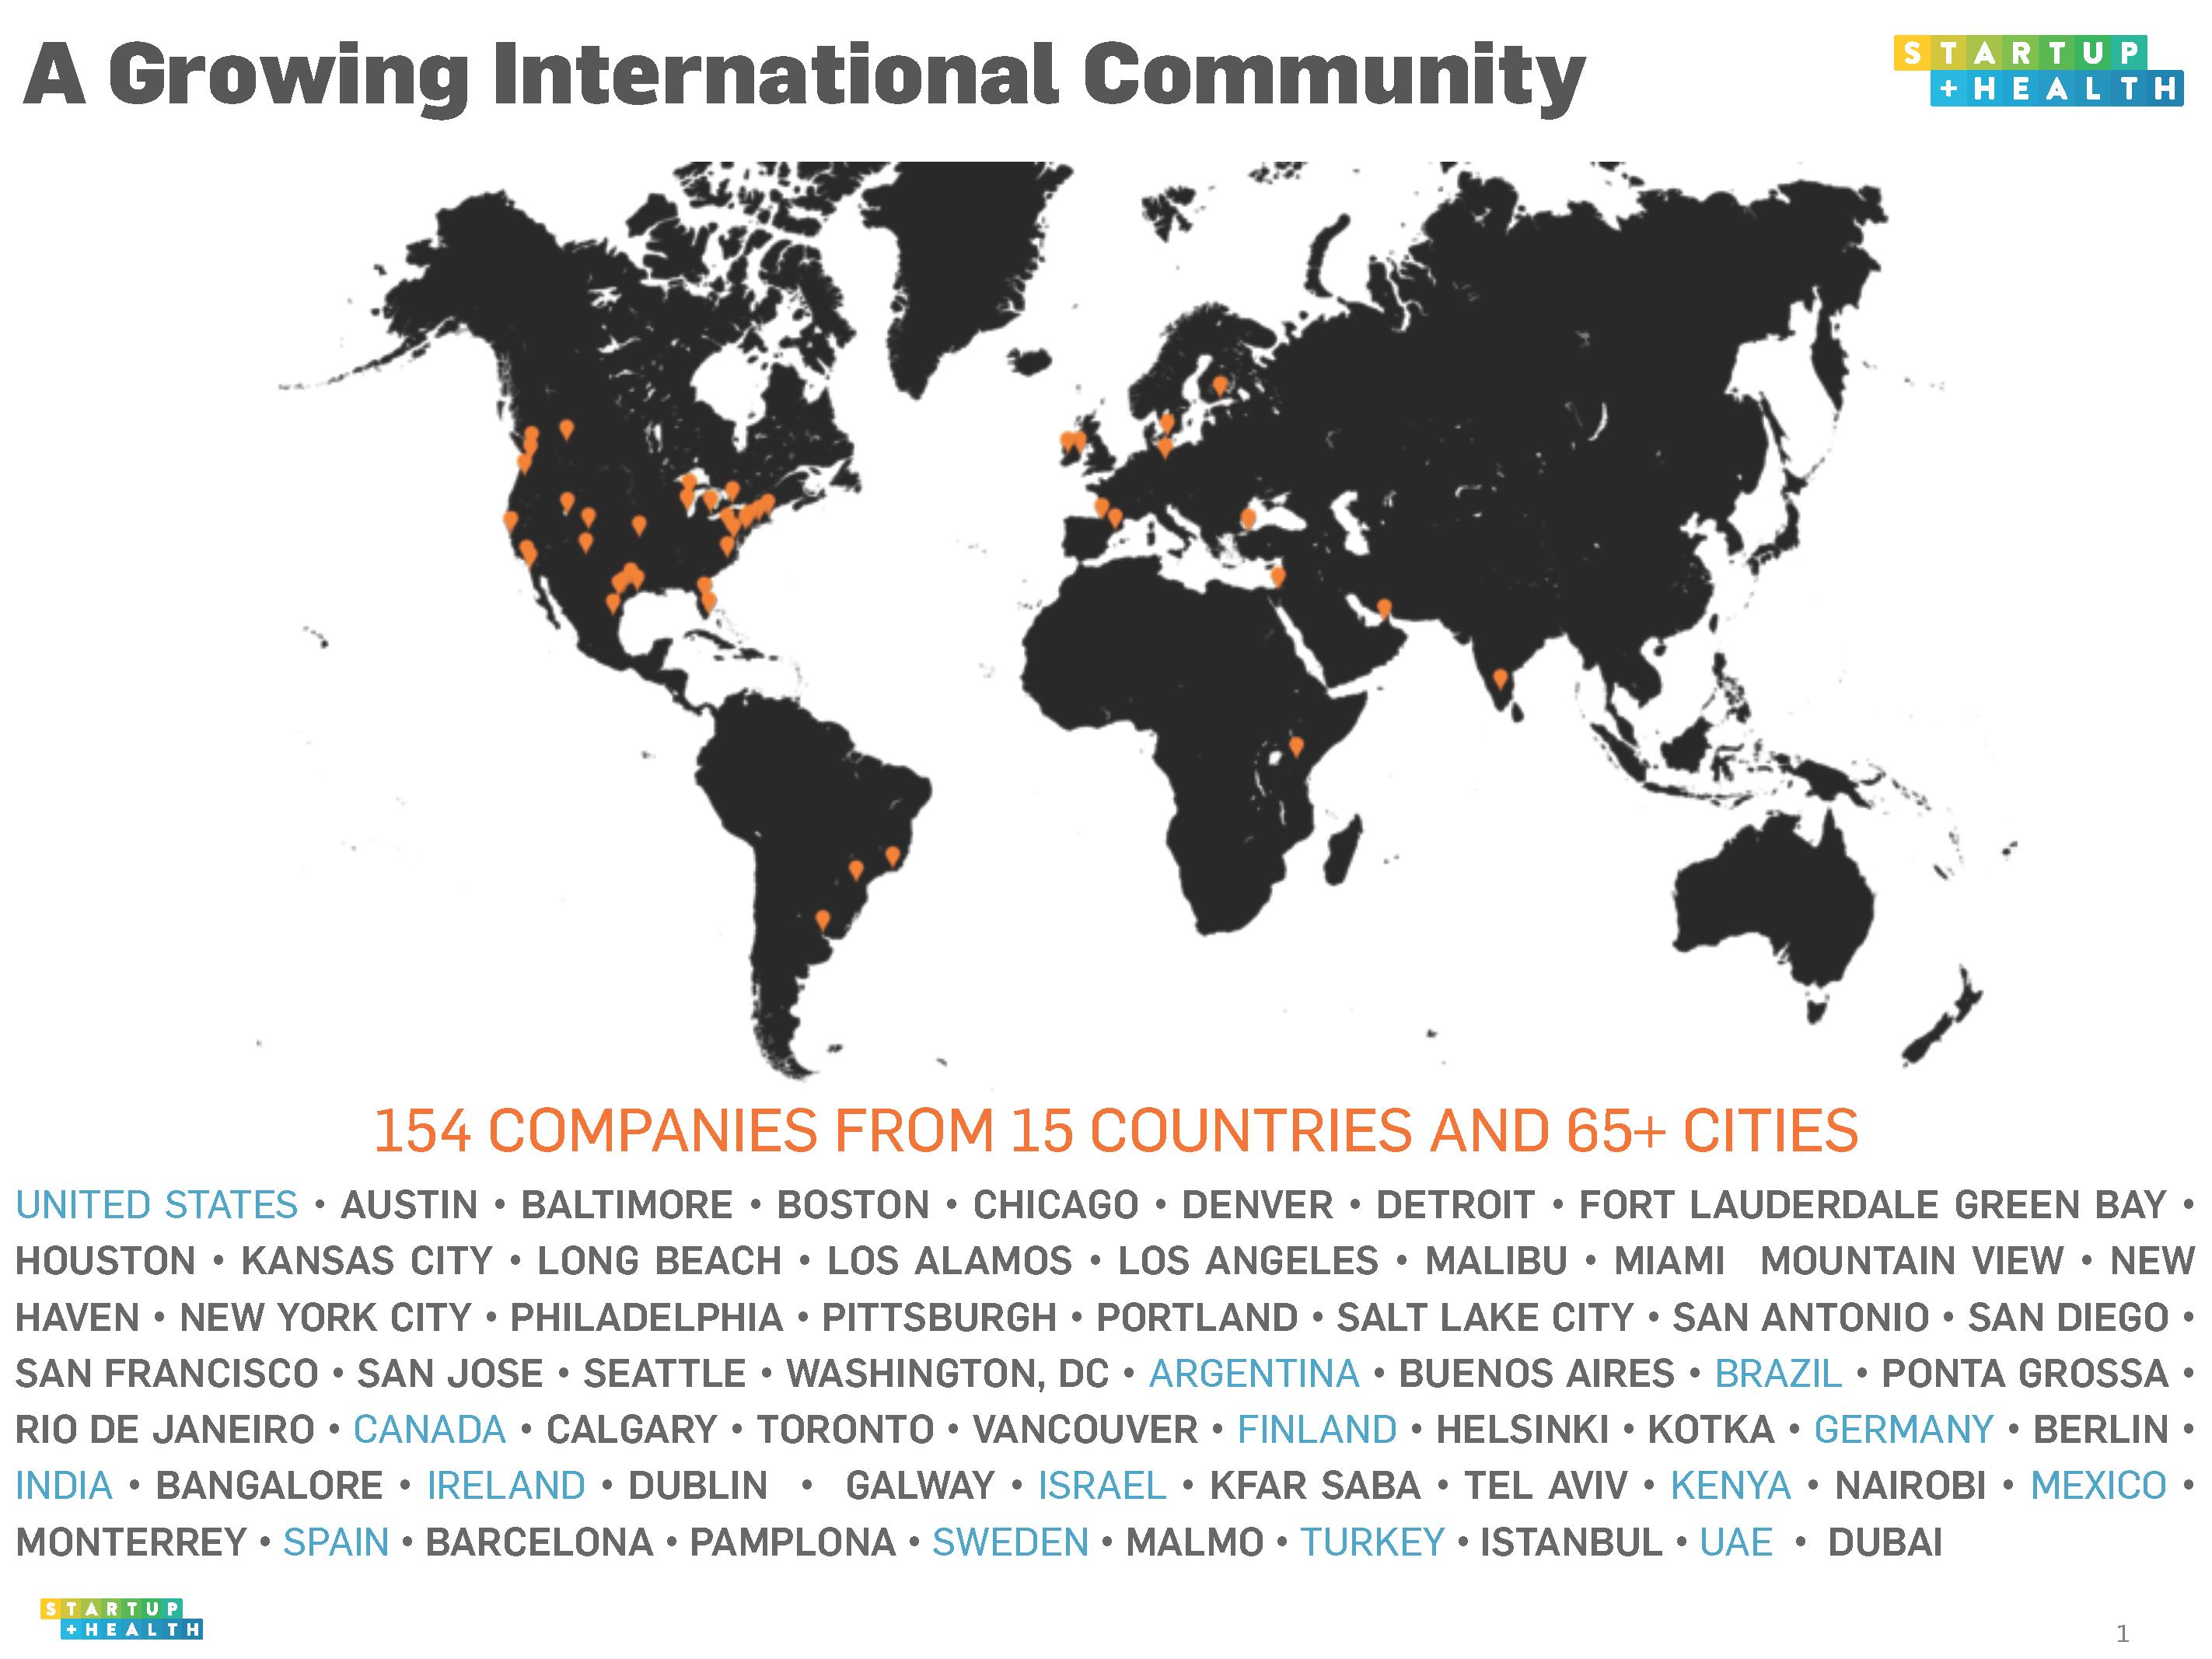 A Growing International Community